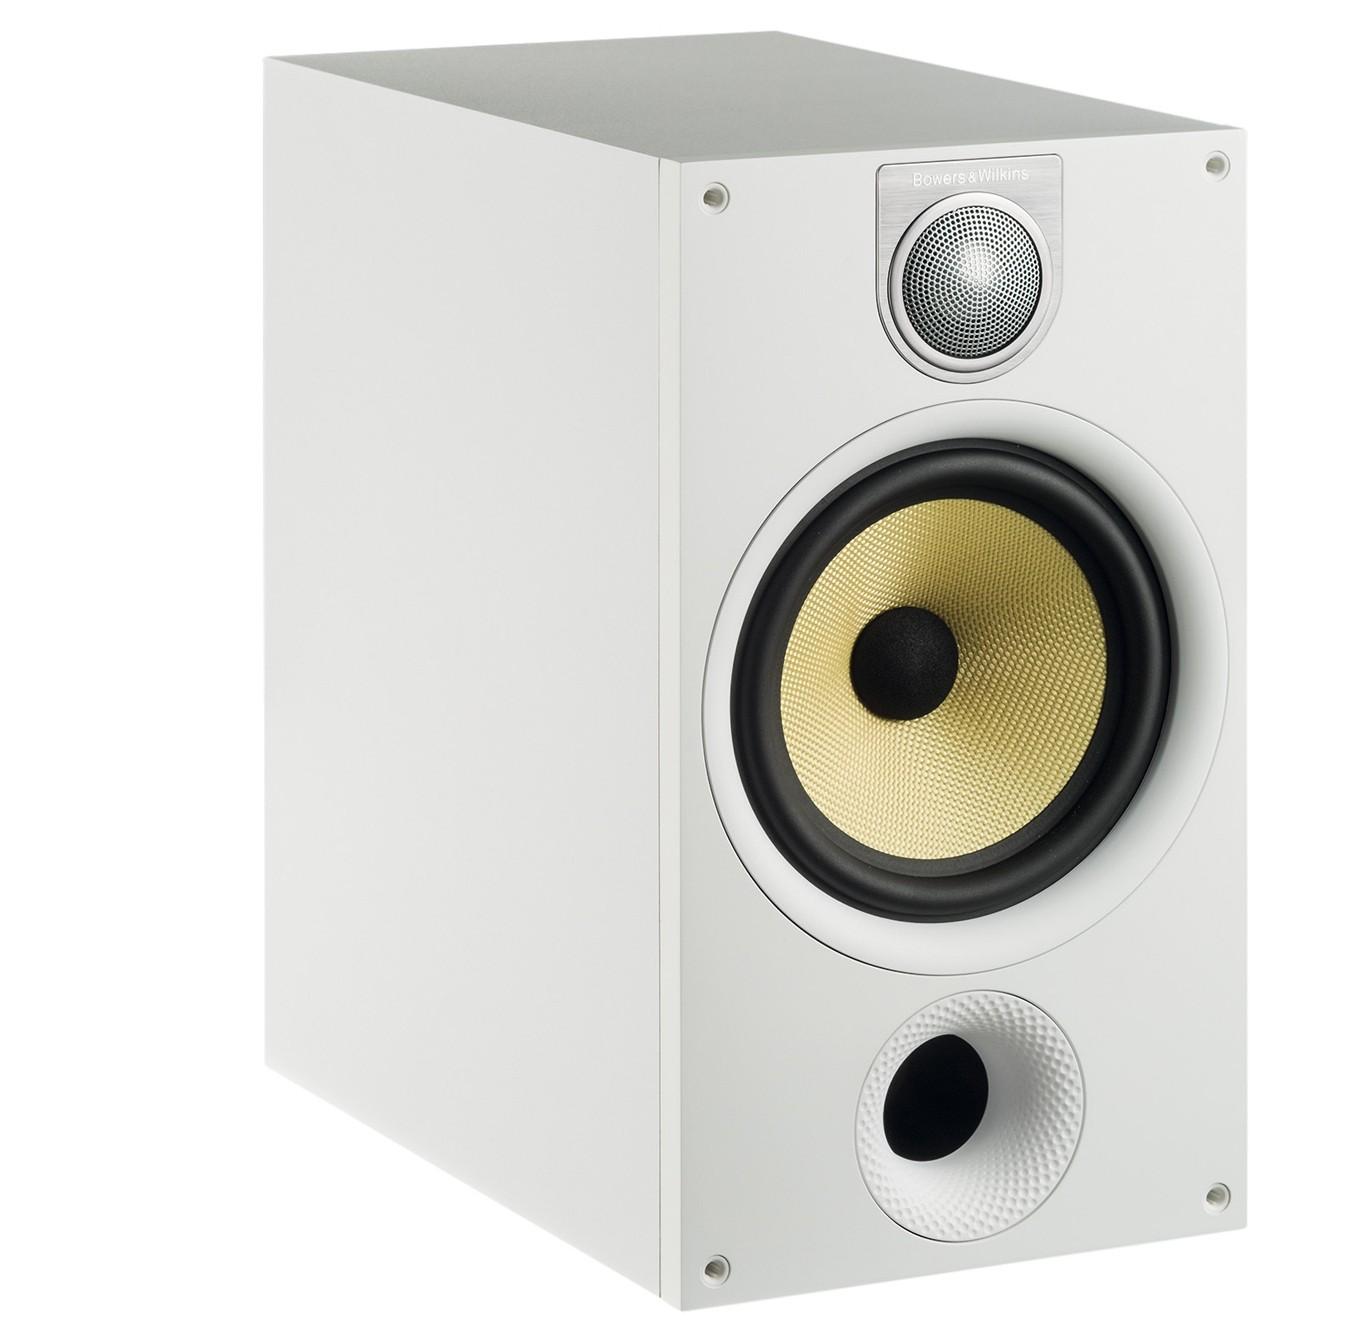 Lautsprecher Stereo B&W Bowers & Wilkins 685 S2 im Test, Bild 2